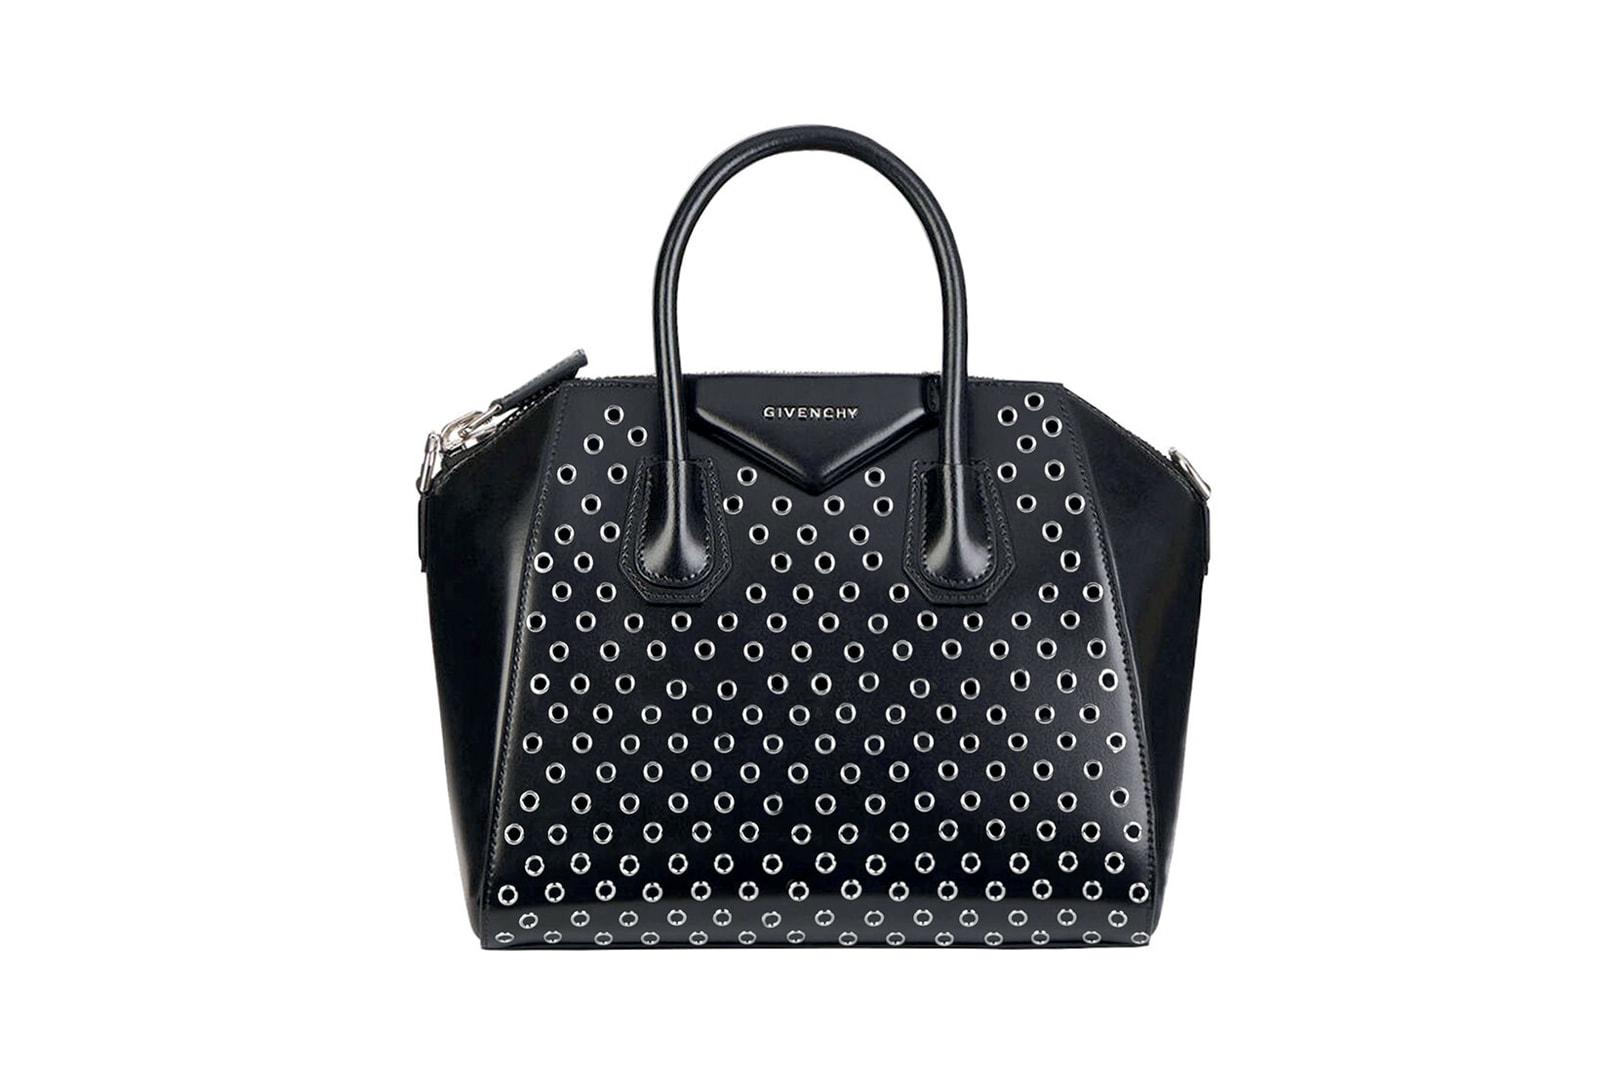 givenchy matthew williams antigona handbags accessories 4g padlocks vertical soft u crossbody